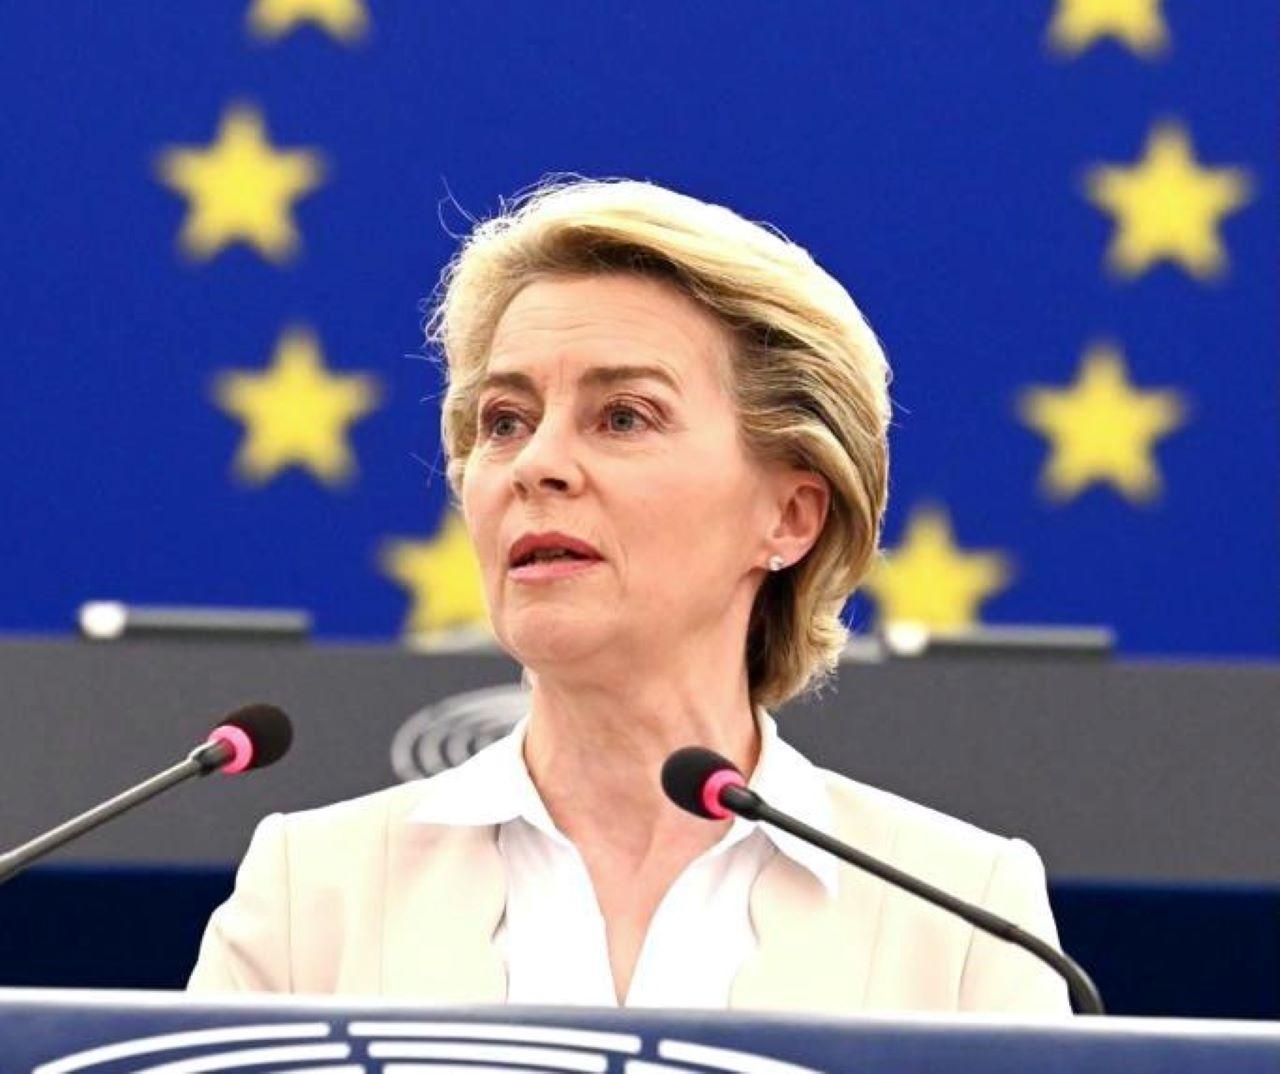 Ursula von der Leyen Commissione Pnrr finanziamenti